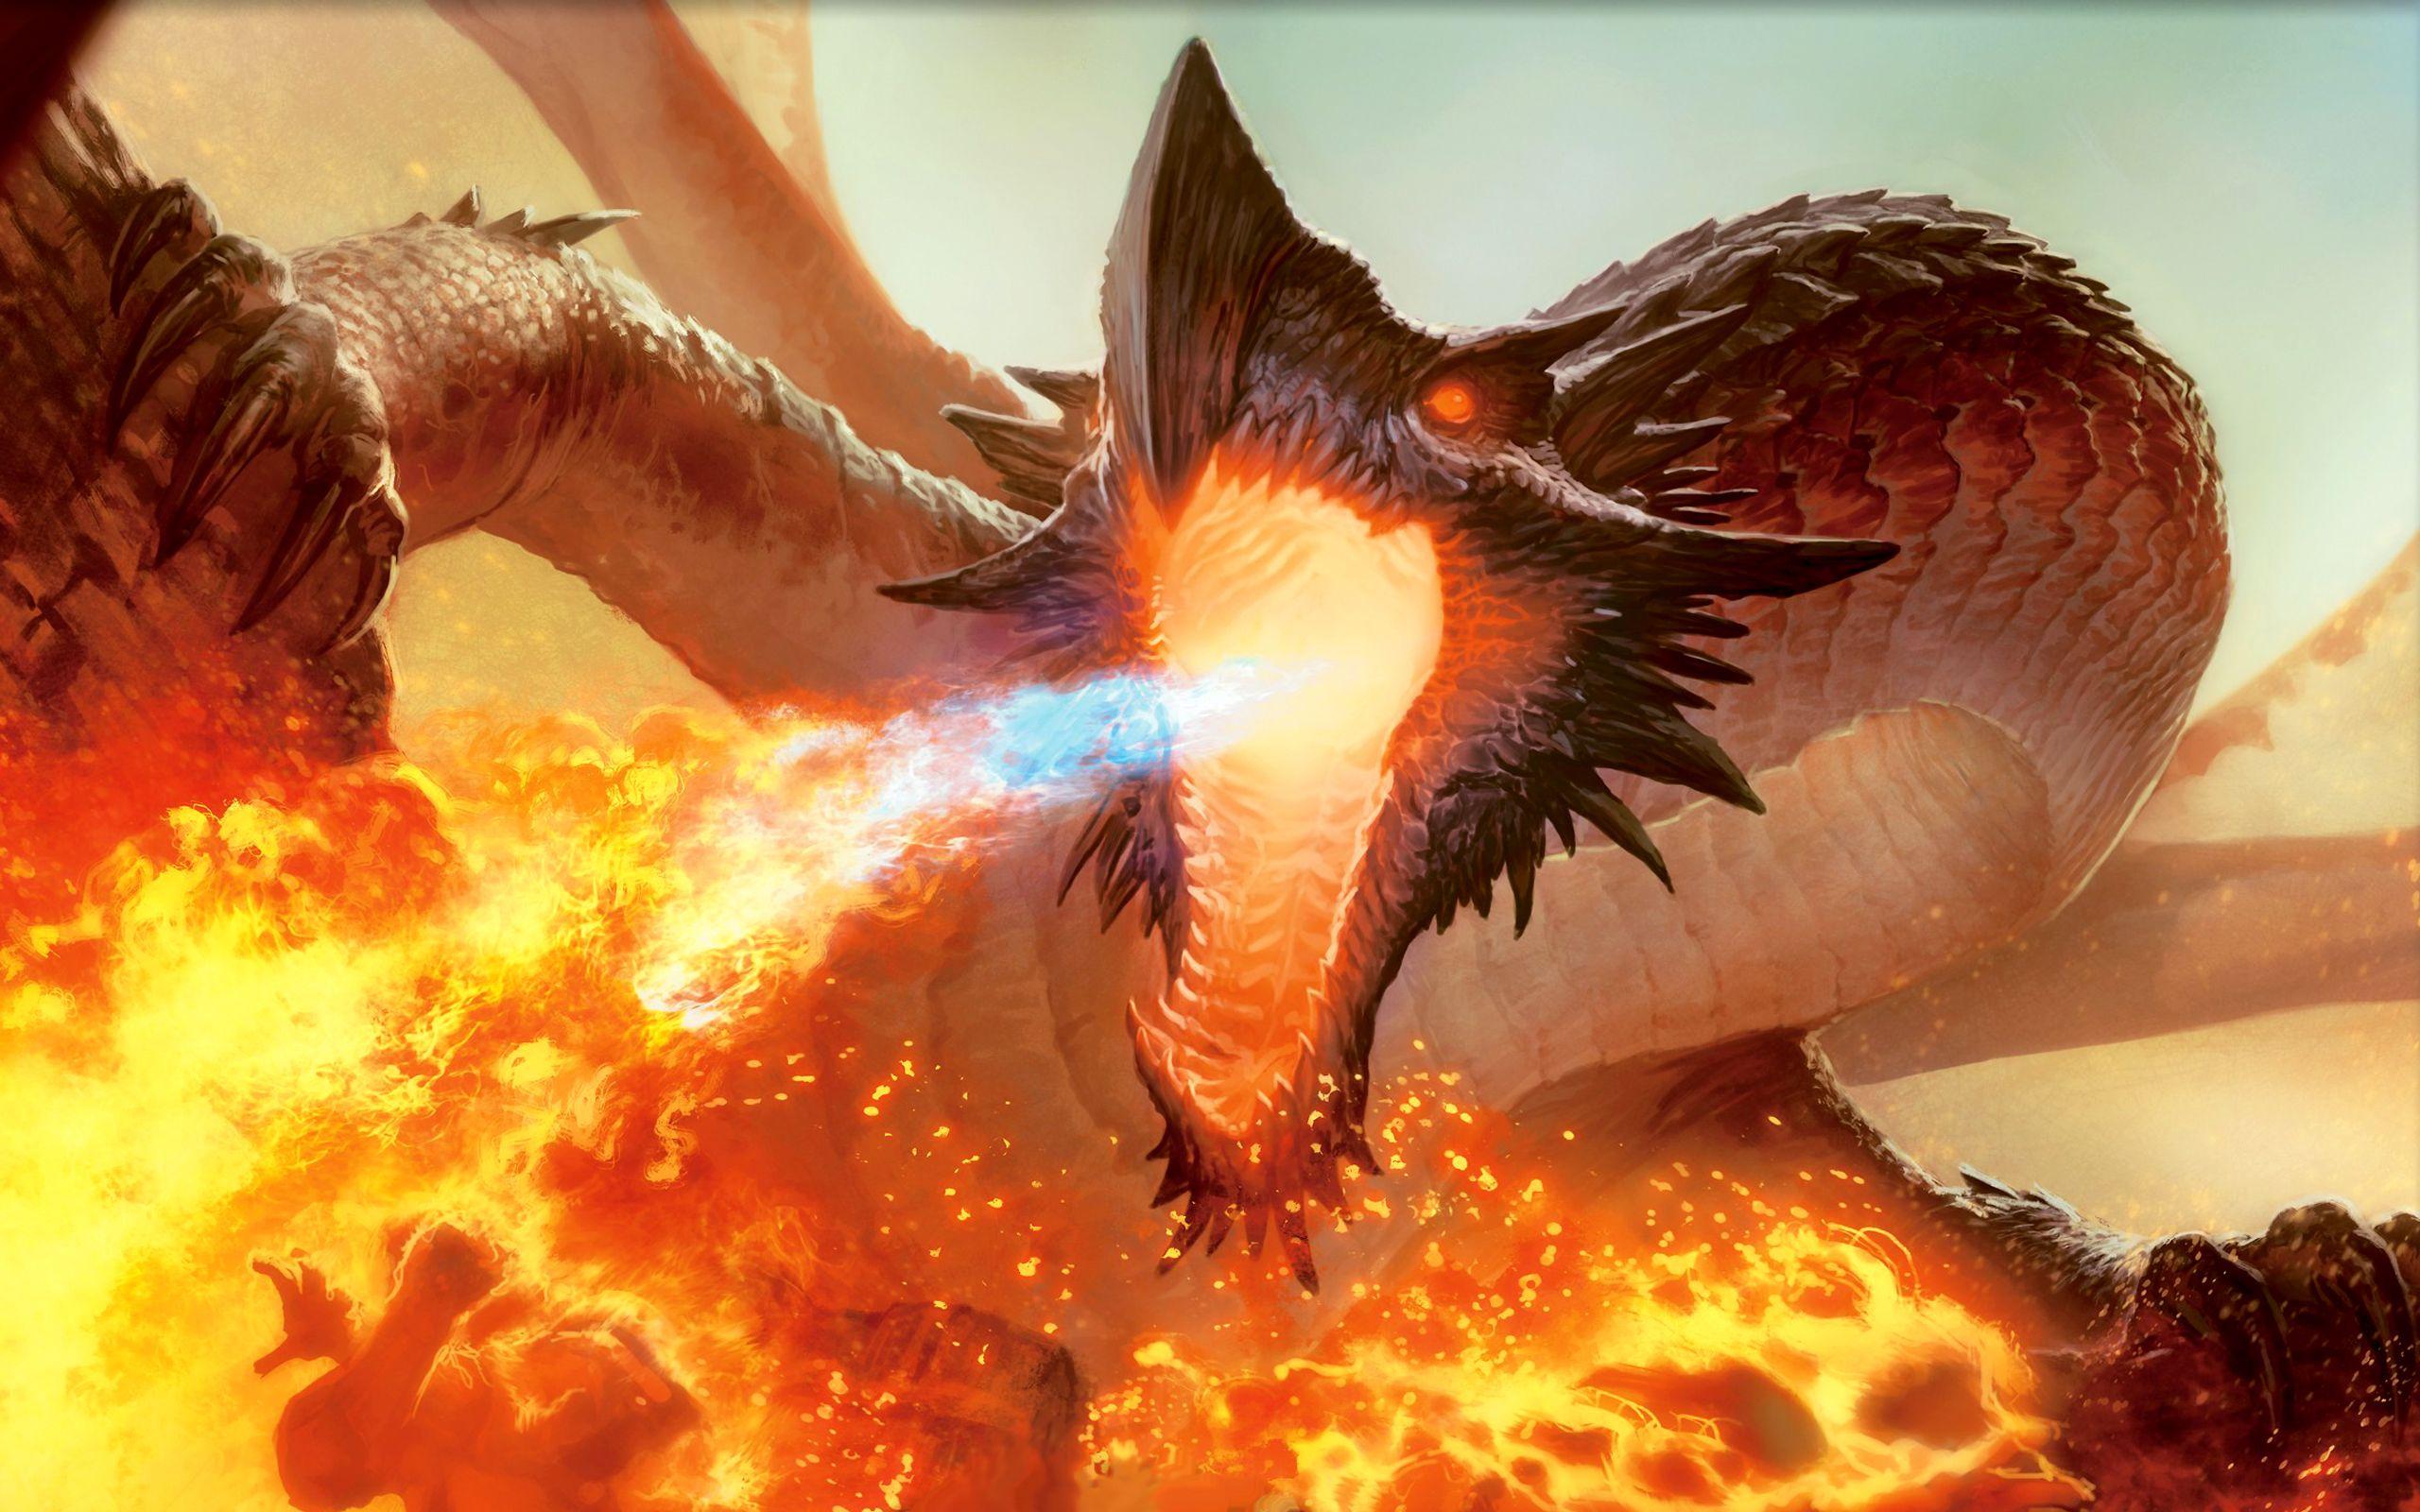 Fantasy Dragon - Dragons Wallpaper (27155012) - Fanpop